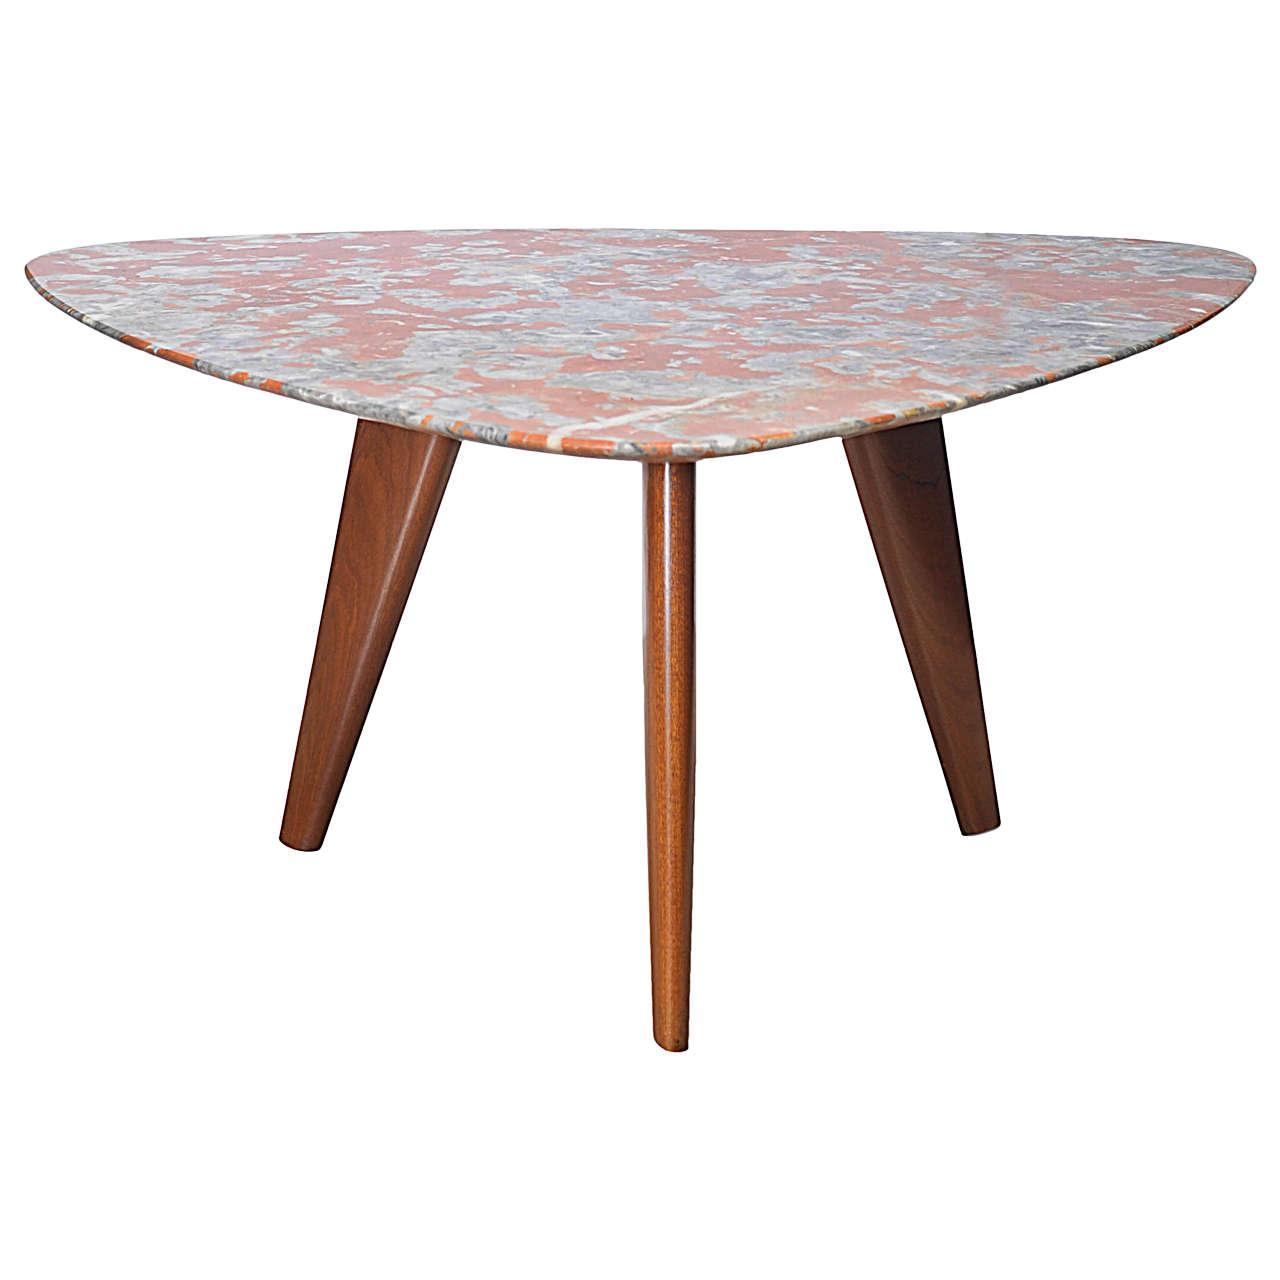 Coffee Table 1950s: 1950s Osvaldo Borsani Coffee Table For Sale At 1stdibs